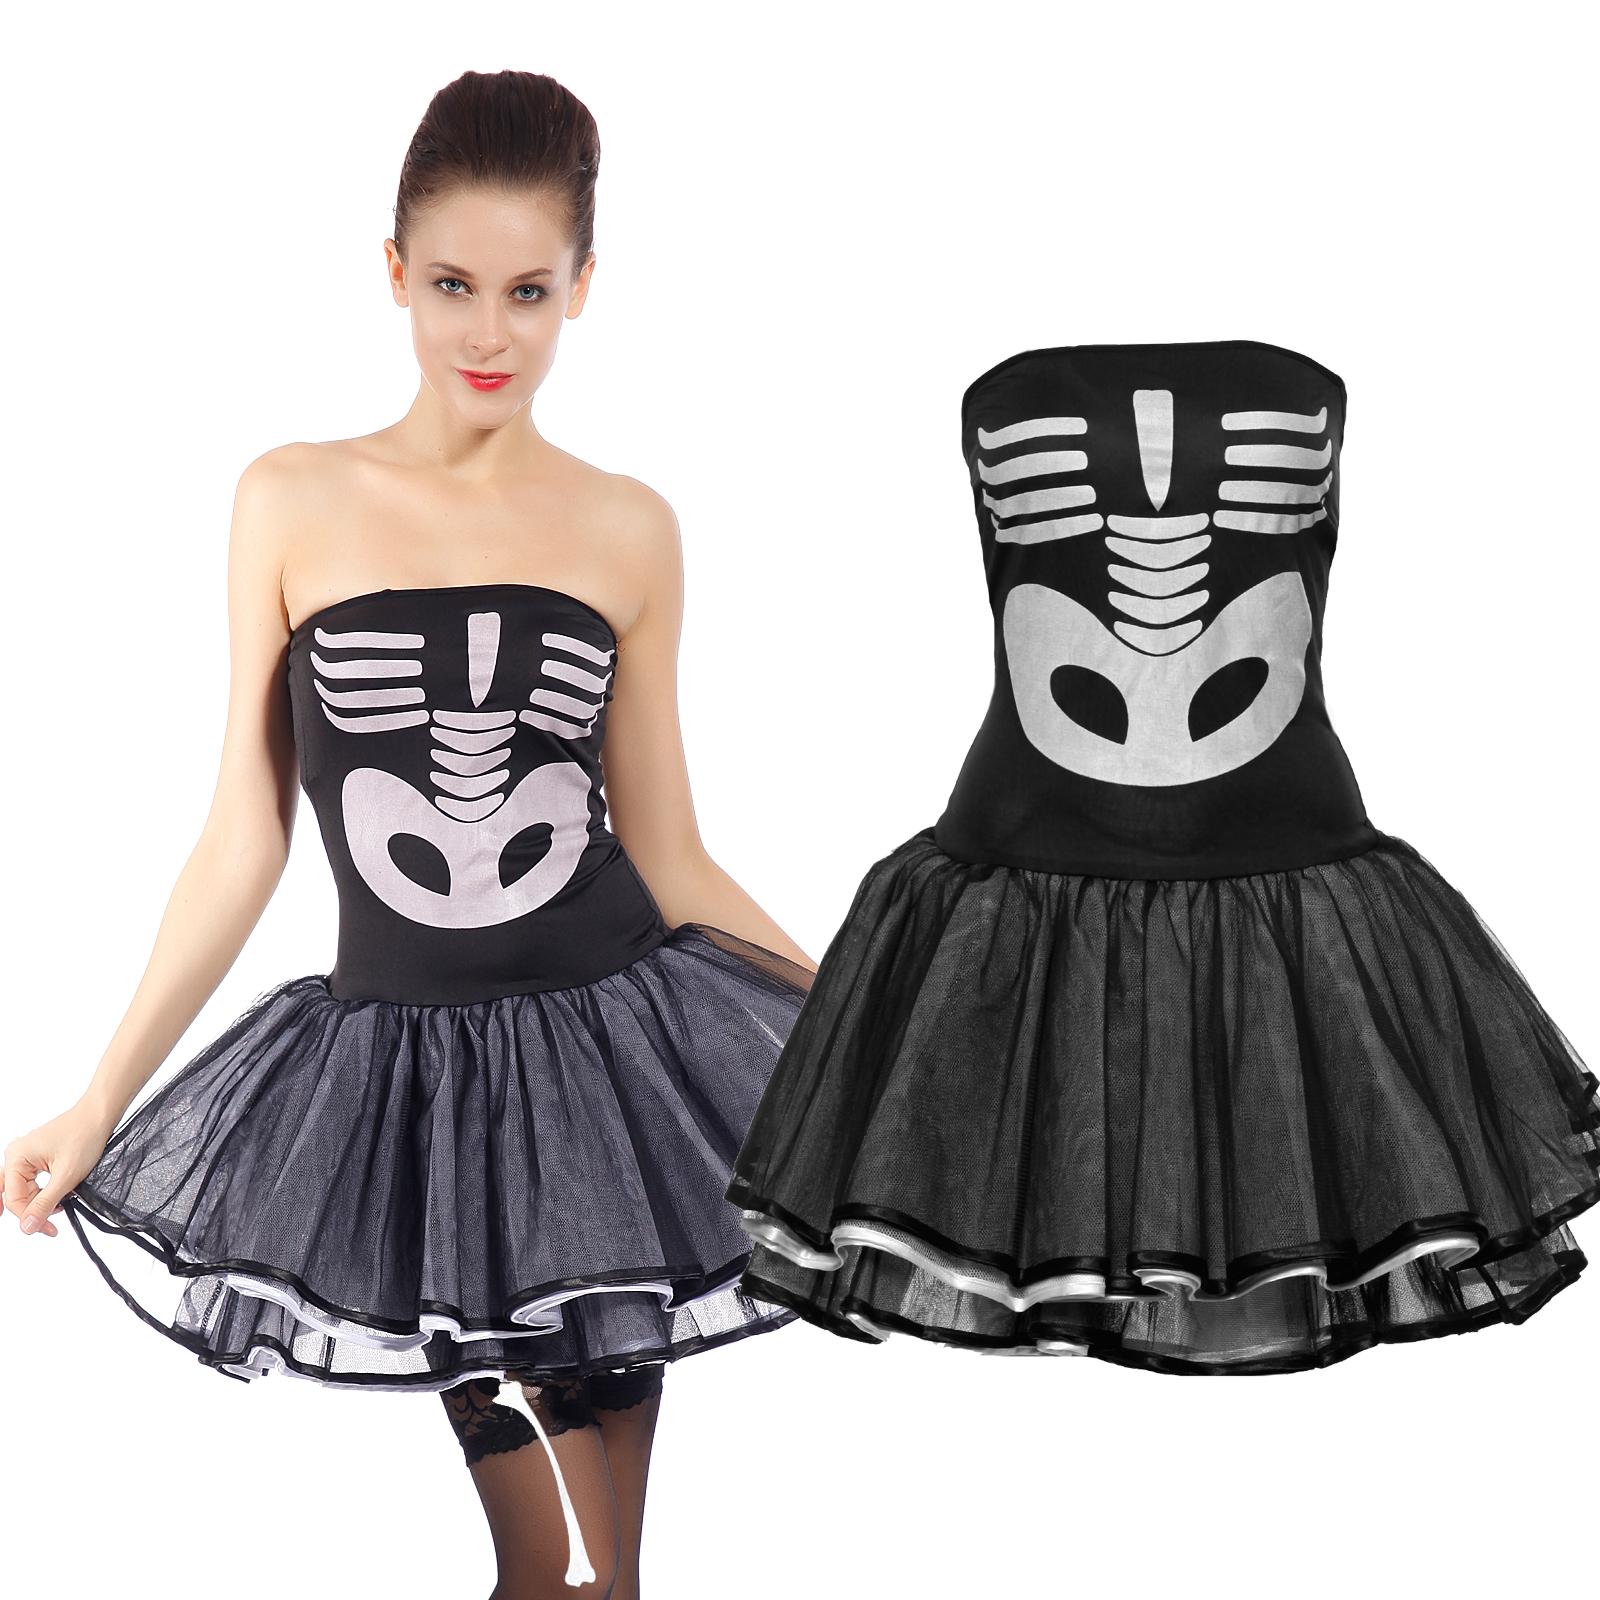 damen skelettkost m zombie vampir geist kost m knochen kleid halloween karneval ebay. Black Bedroom Furniture Sets. Home Design Ideas